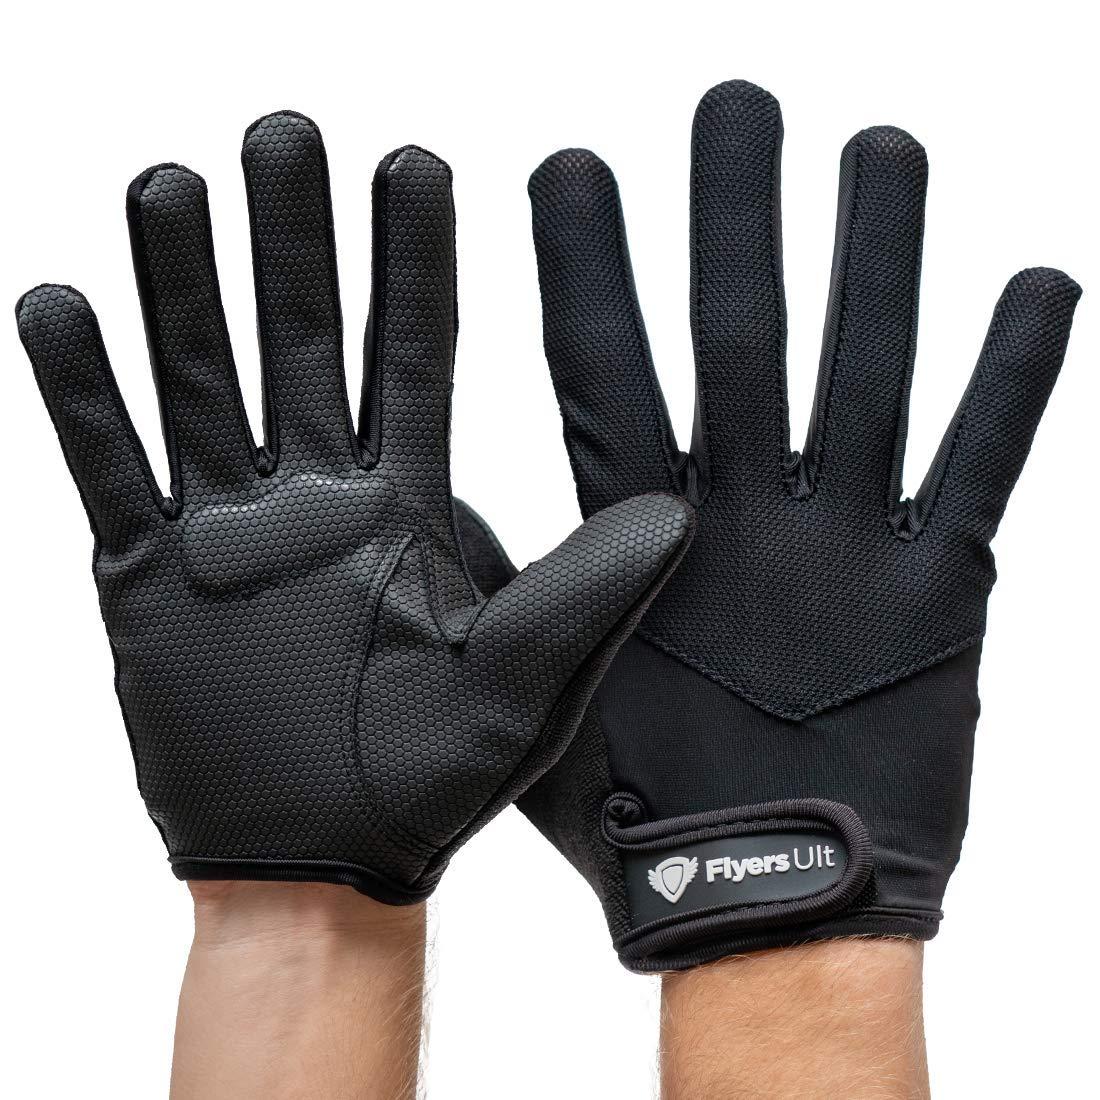 Flyers Ult Pentaero 究極のフリスビー手袋 B07J9KZS61 Large